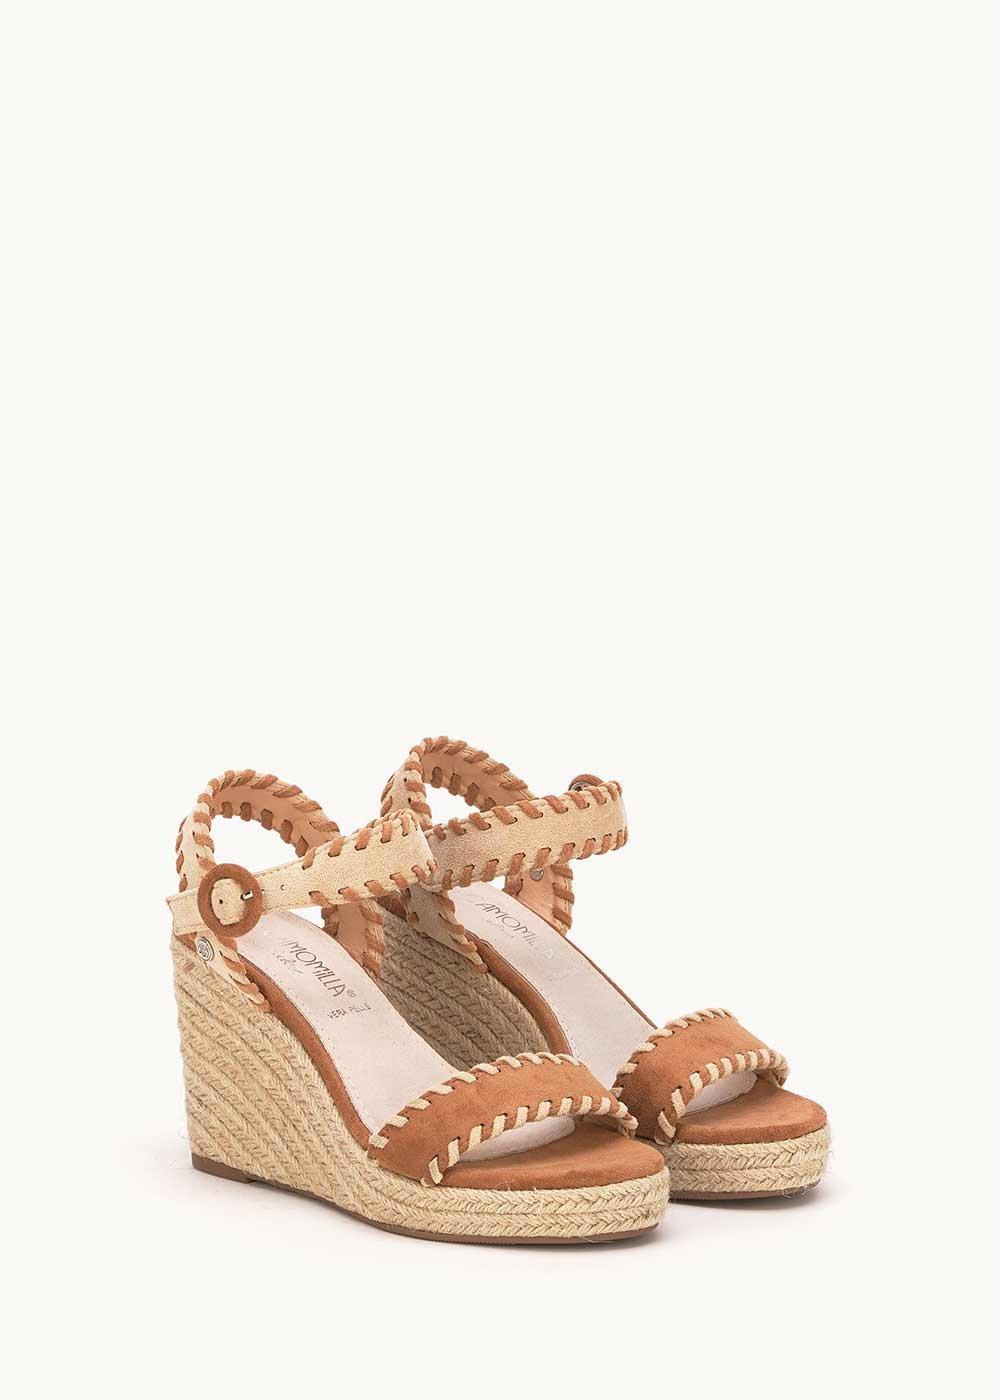 Sandalo Saint con impunture a contrasto - Pecan  / Doeskin - Donna